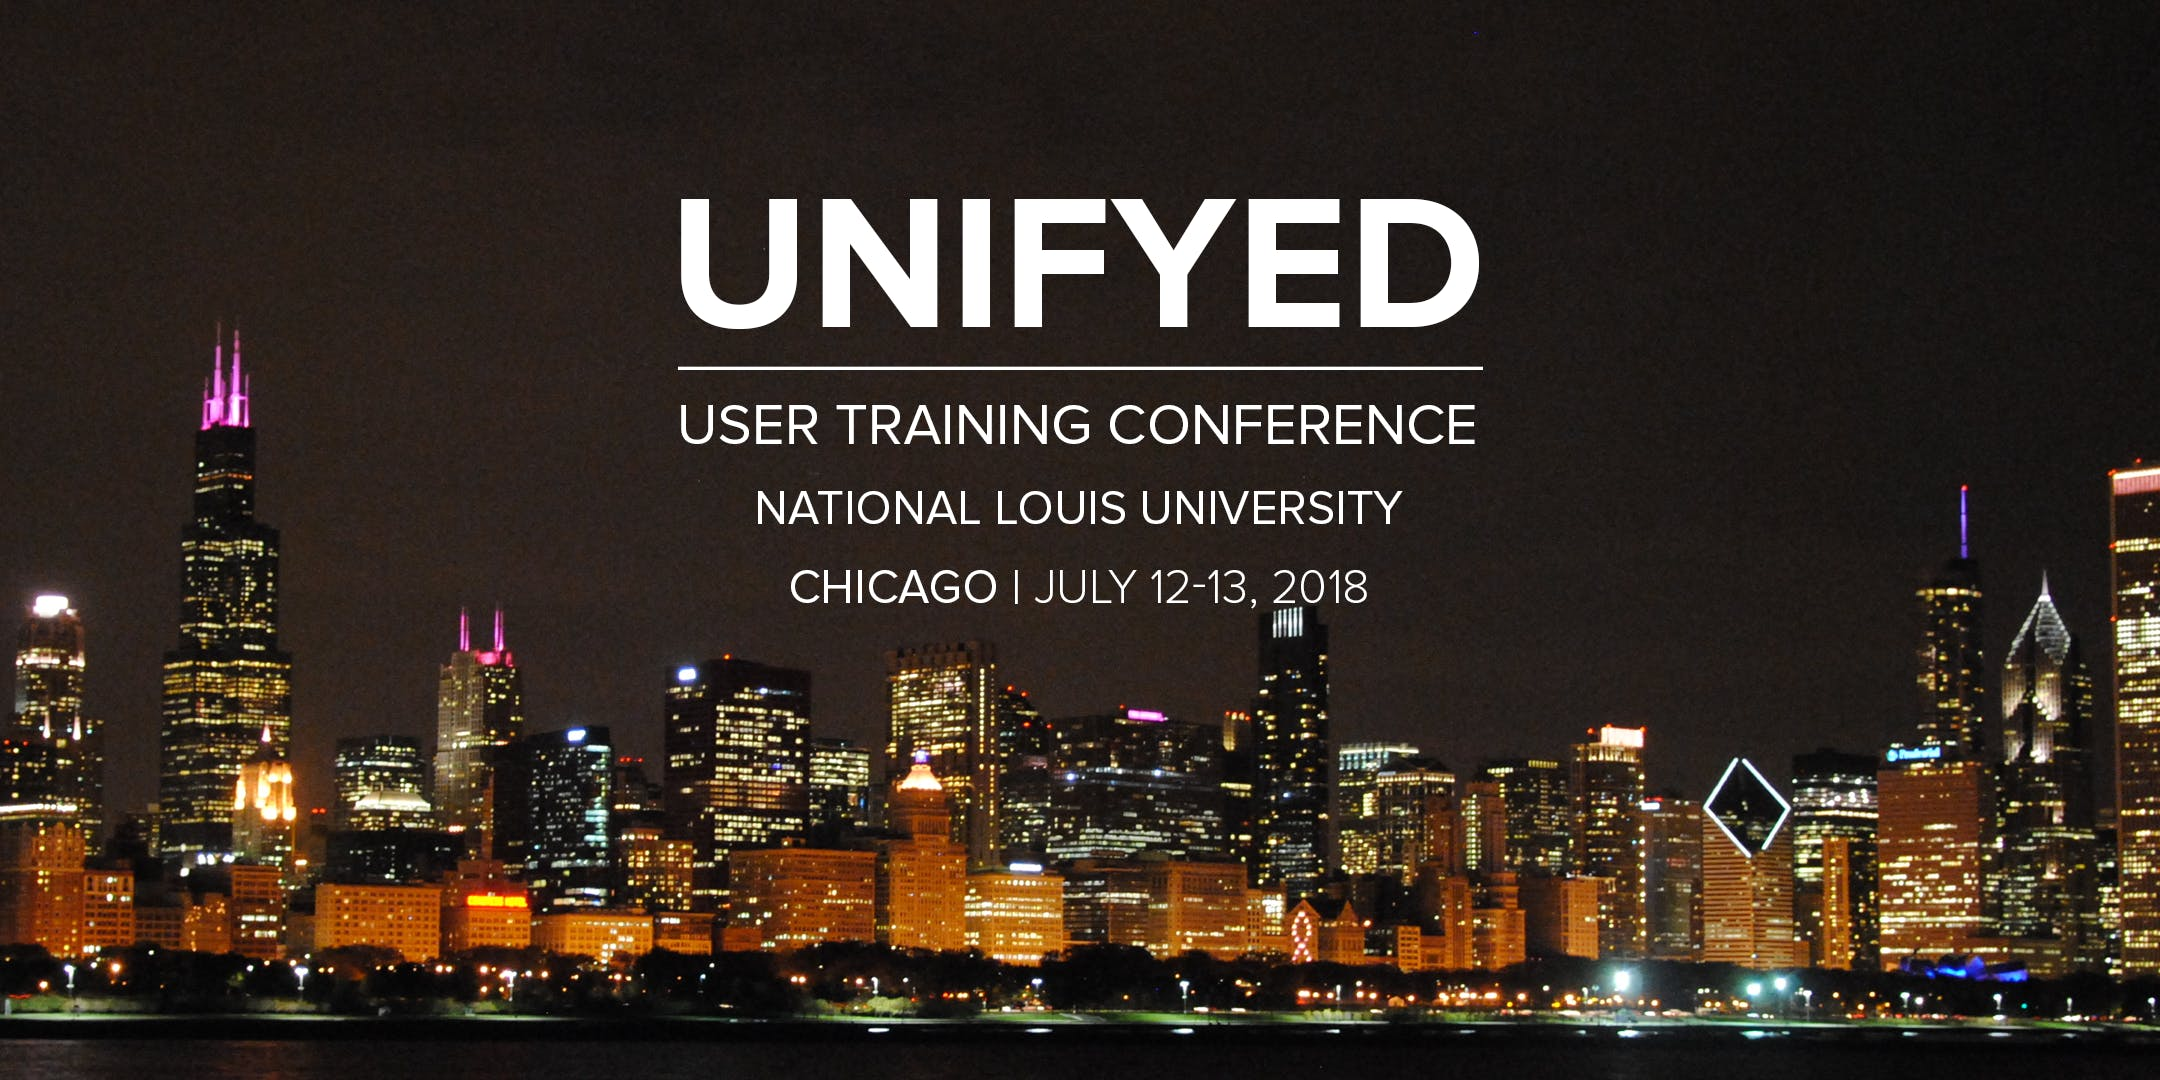 Unifyed User Training Conference 2018